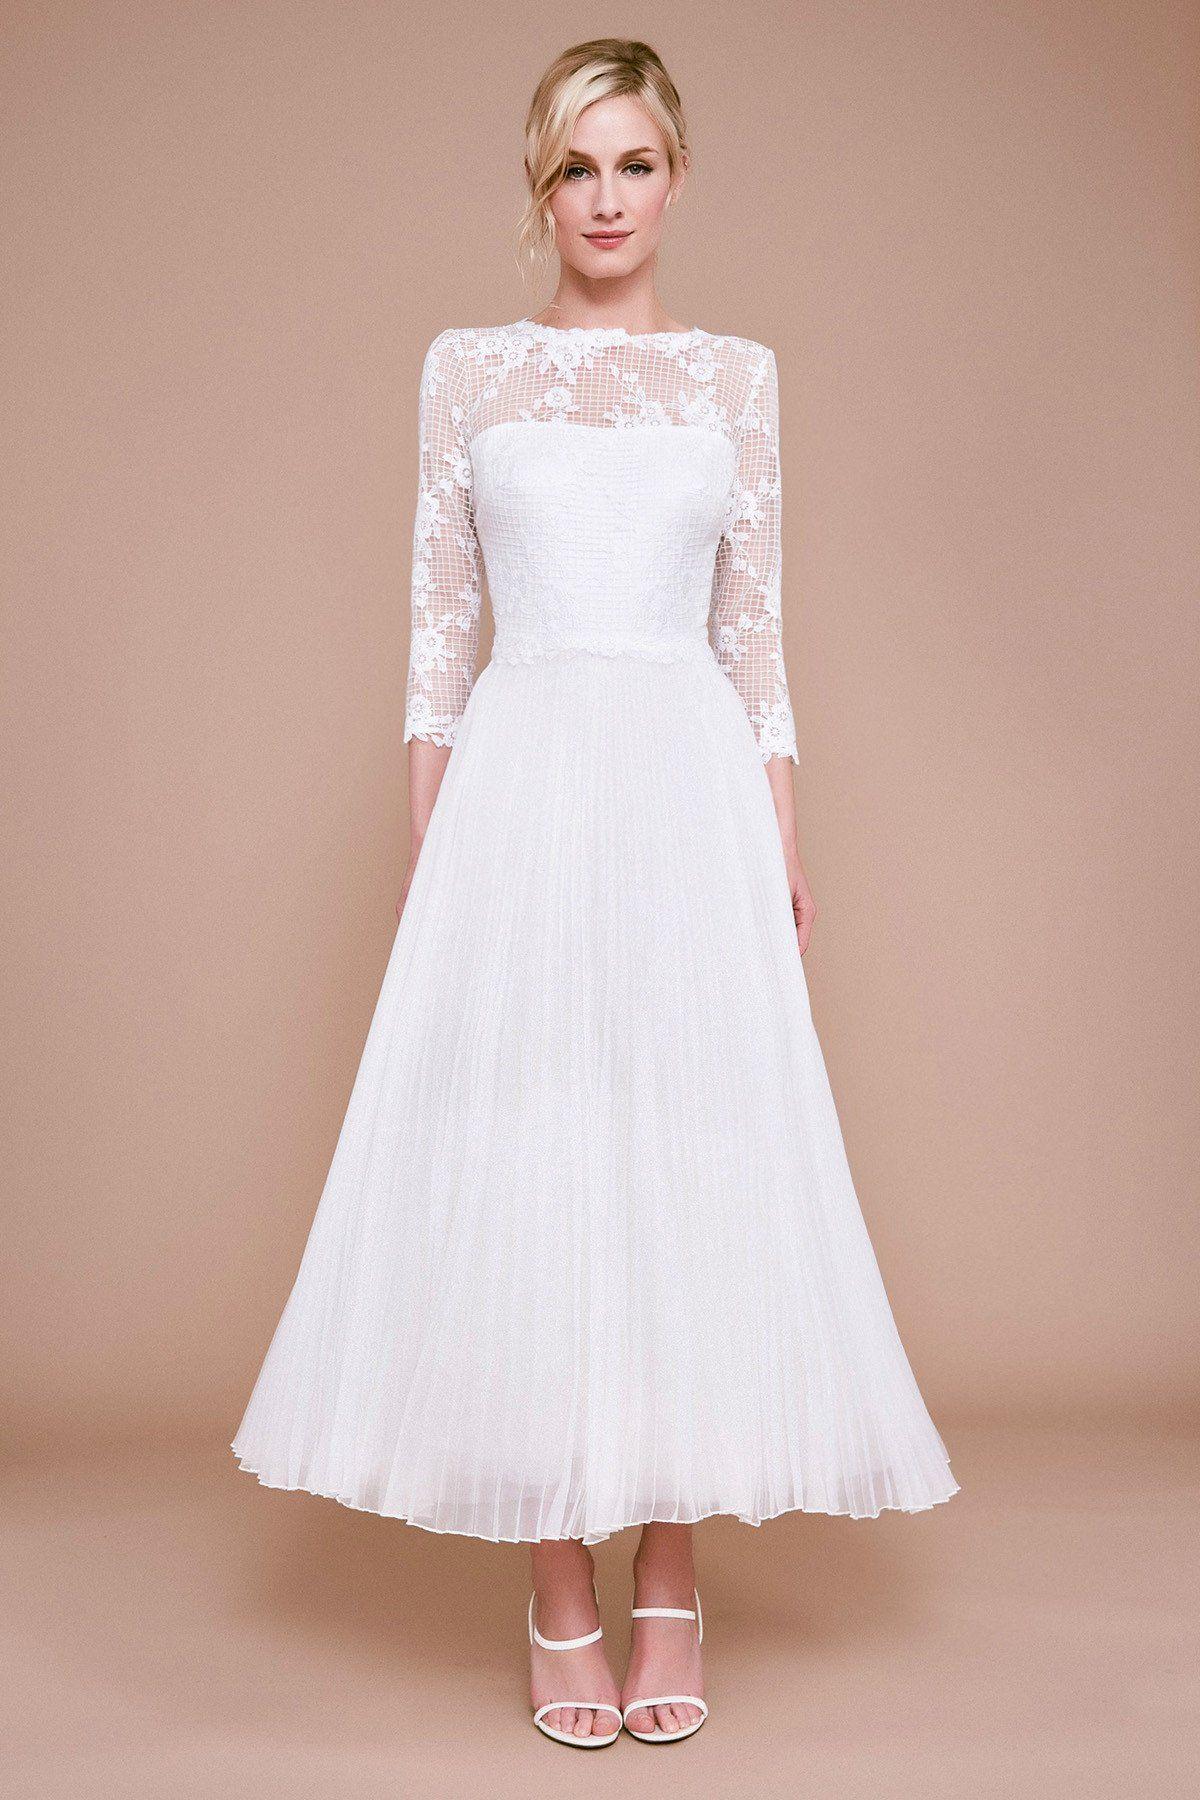 Tadashi Shoji Keats Lace Tulle Tea Length Dress In 2021 Tea Length Dresses Tea Length Wedding Dress Wedding Dress Styles Chart [ 1800 x 1200 Pixel ]